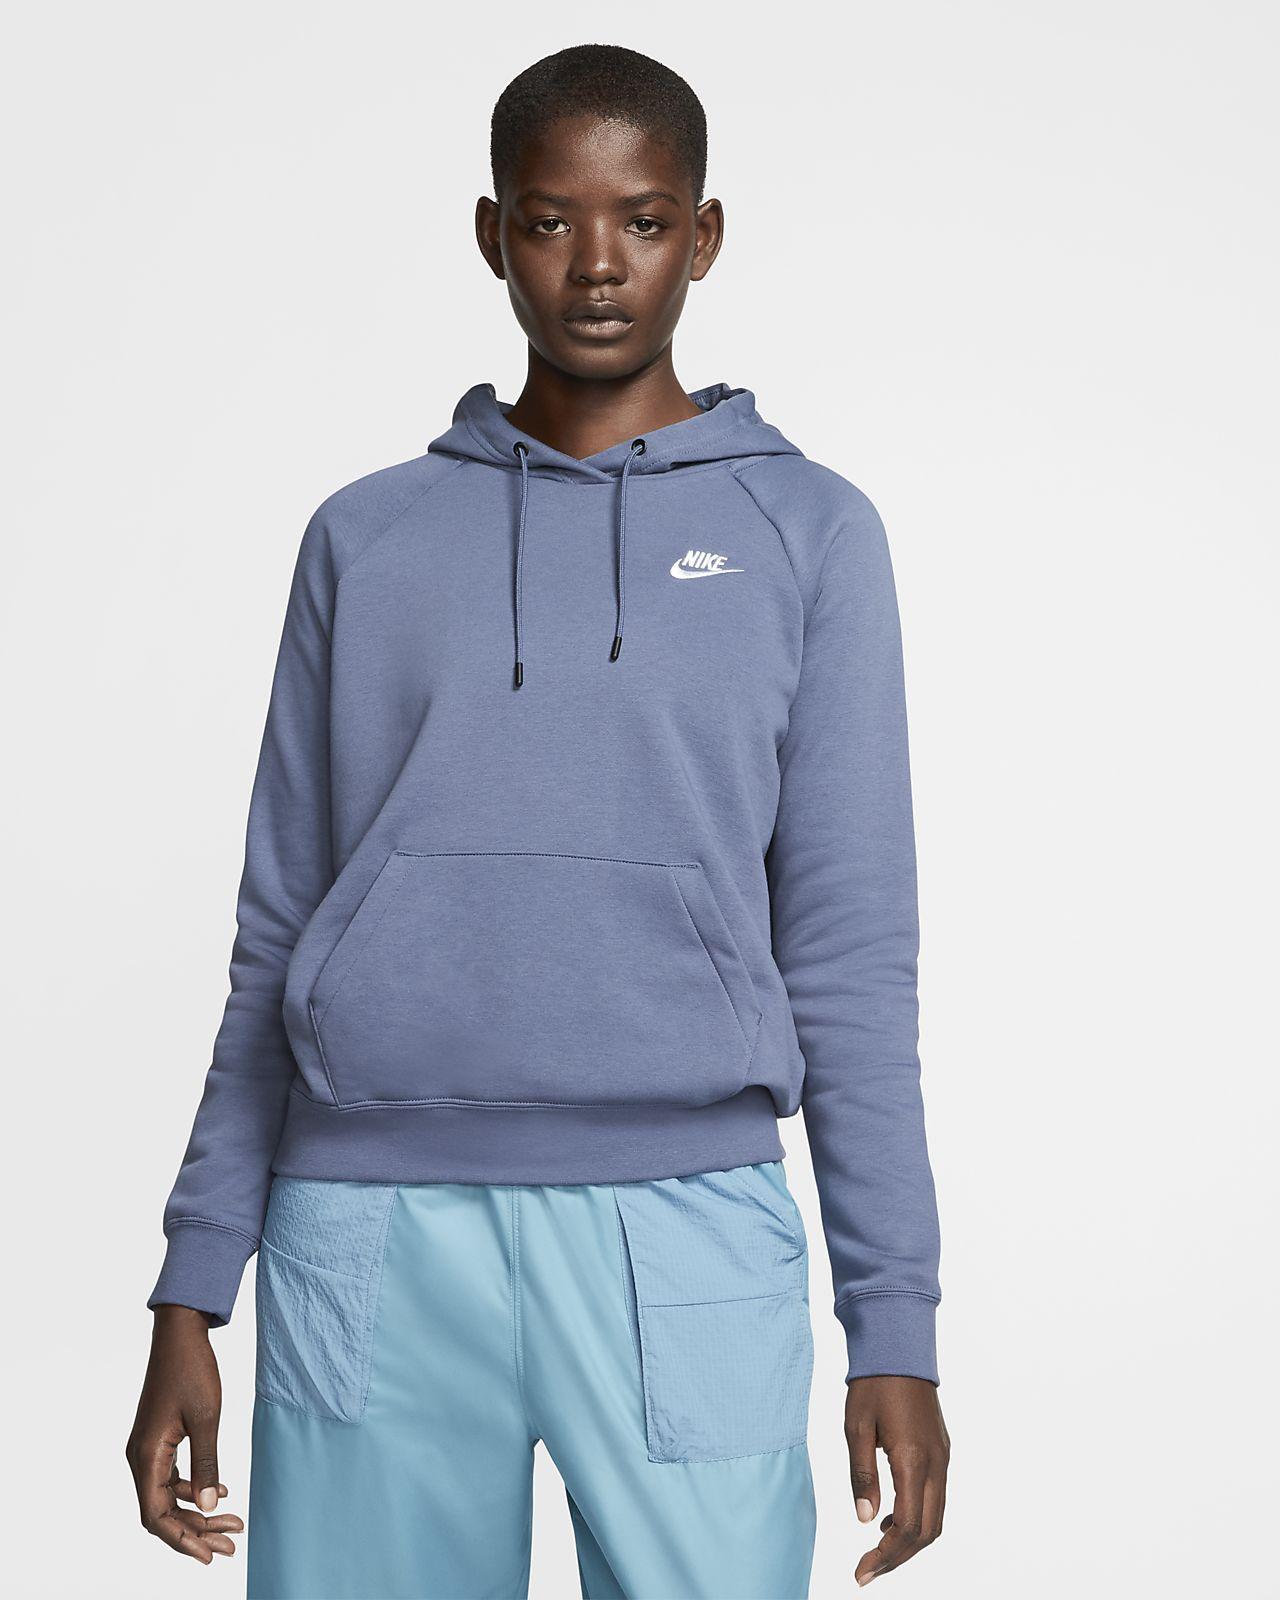 Https Static Nike Com A Images T Pdp 1280 V1 F Auto B Rgb F5f5f5 02cd195b 443c 4bfe B329 65e2b Fleece Pullover Womens Nike Fleece Hoodie Nike Pullover Hoodie [ 1600 x 1280 Pixel ]